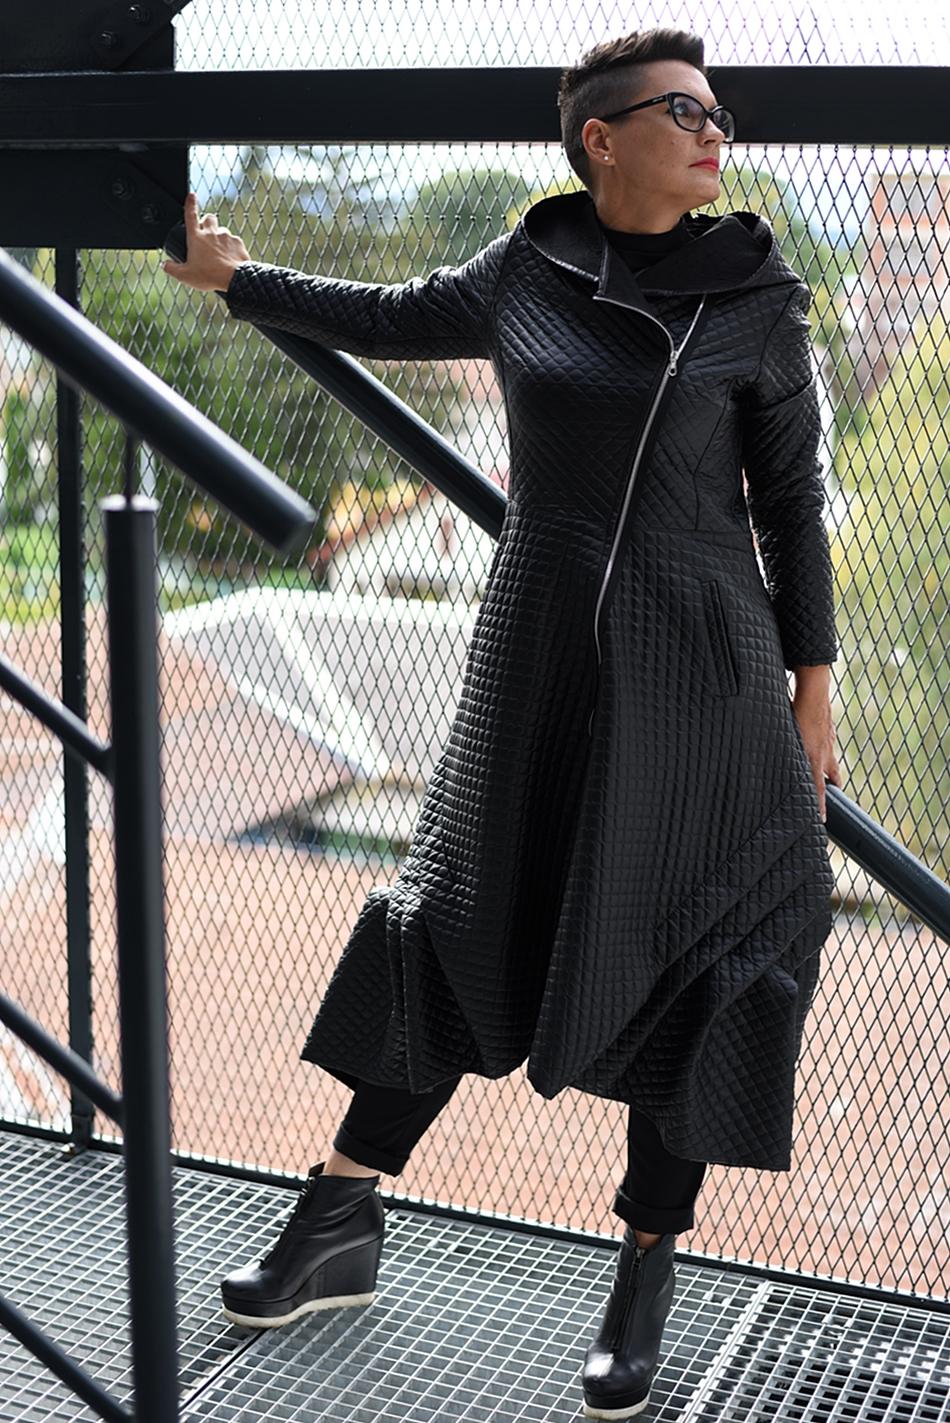 Broth_design_clothes_061